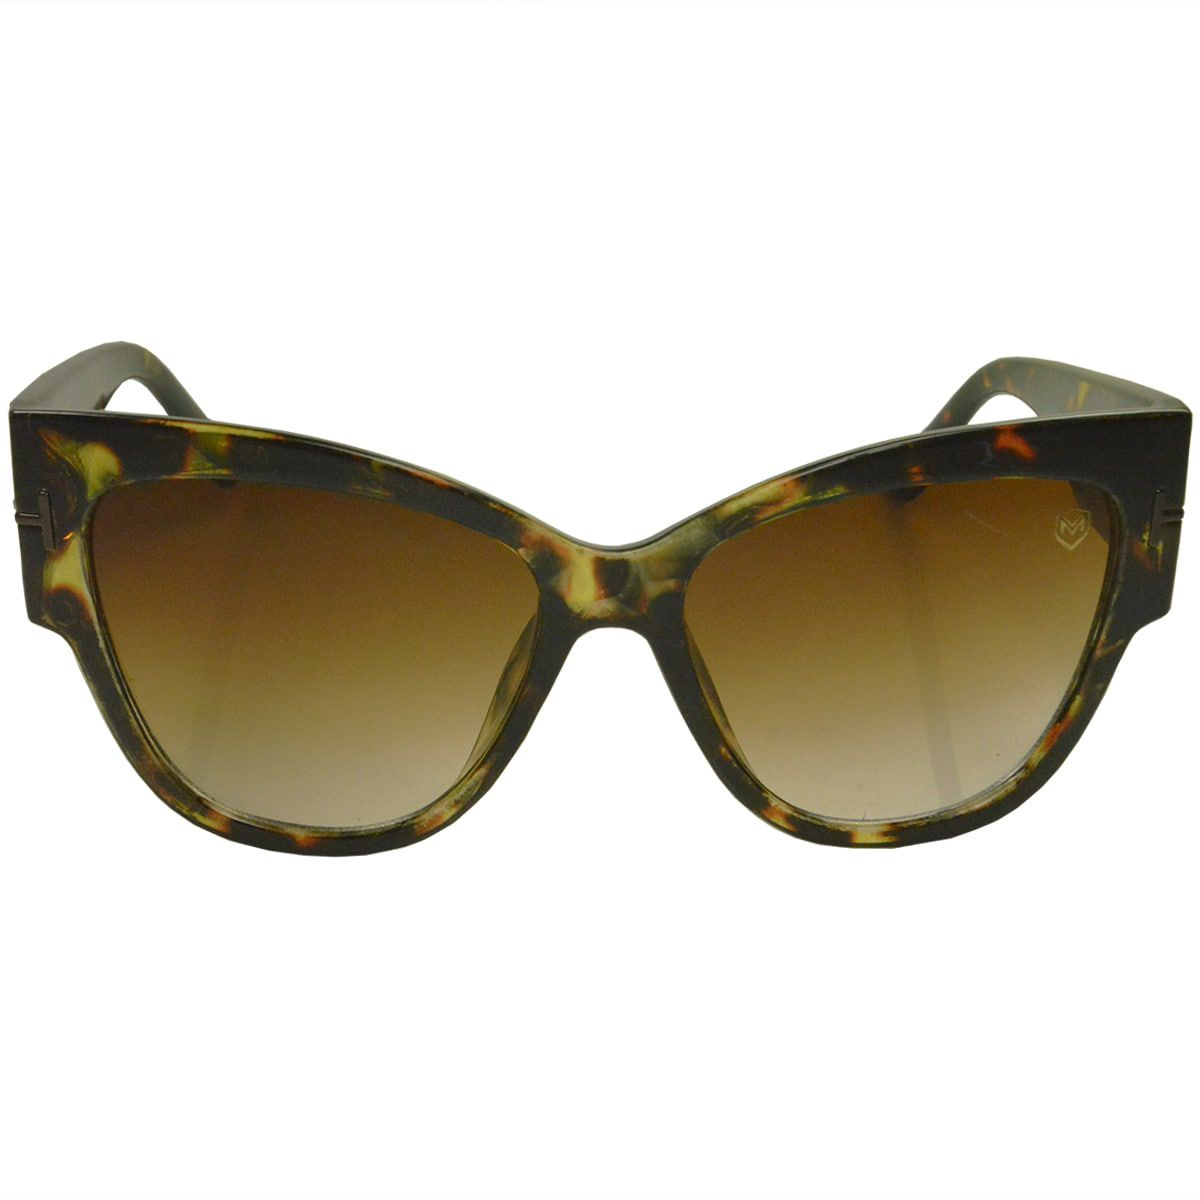 Óculos De Sol Mackage Feminino Acetato Oversize Gateado - Tarta